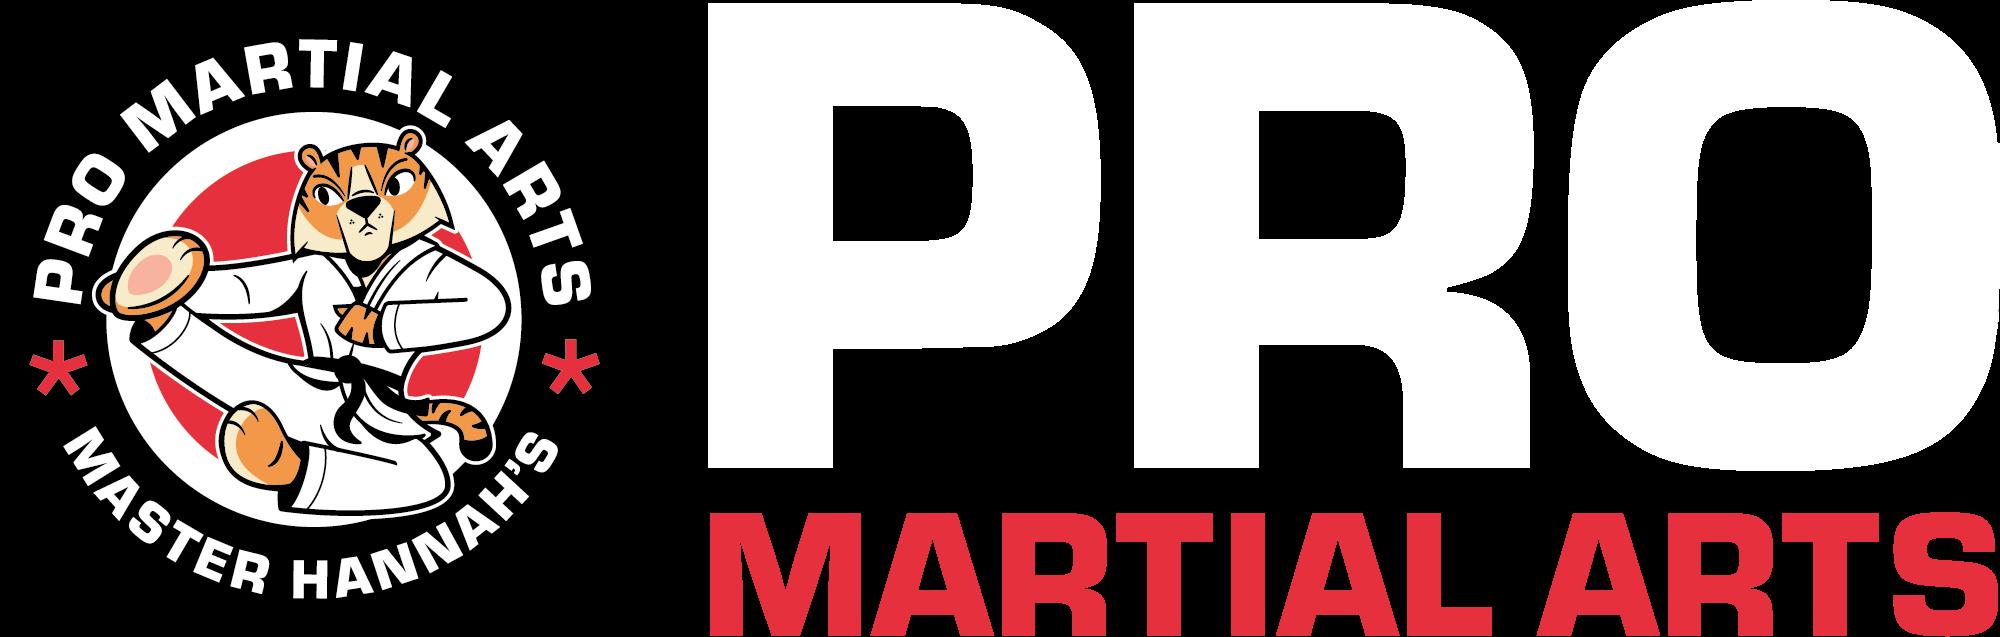 Master Hannah's PRO Martial Arts